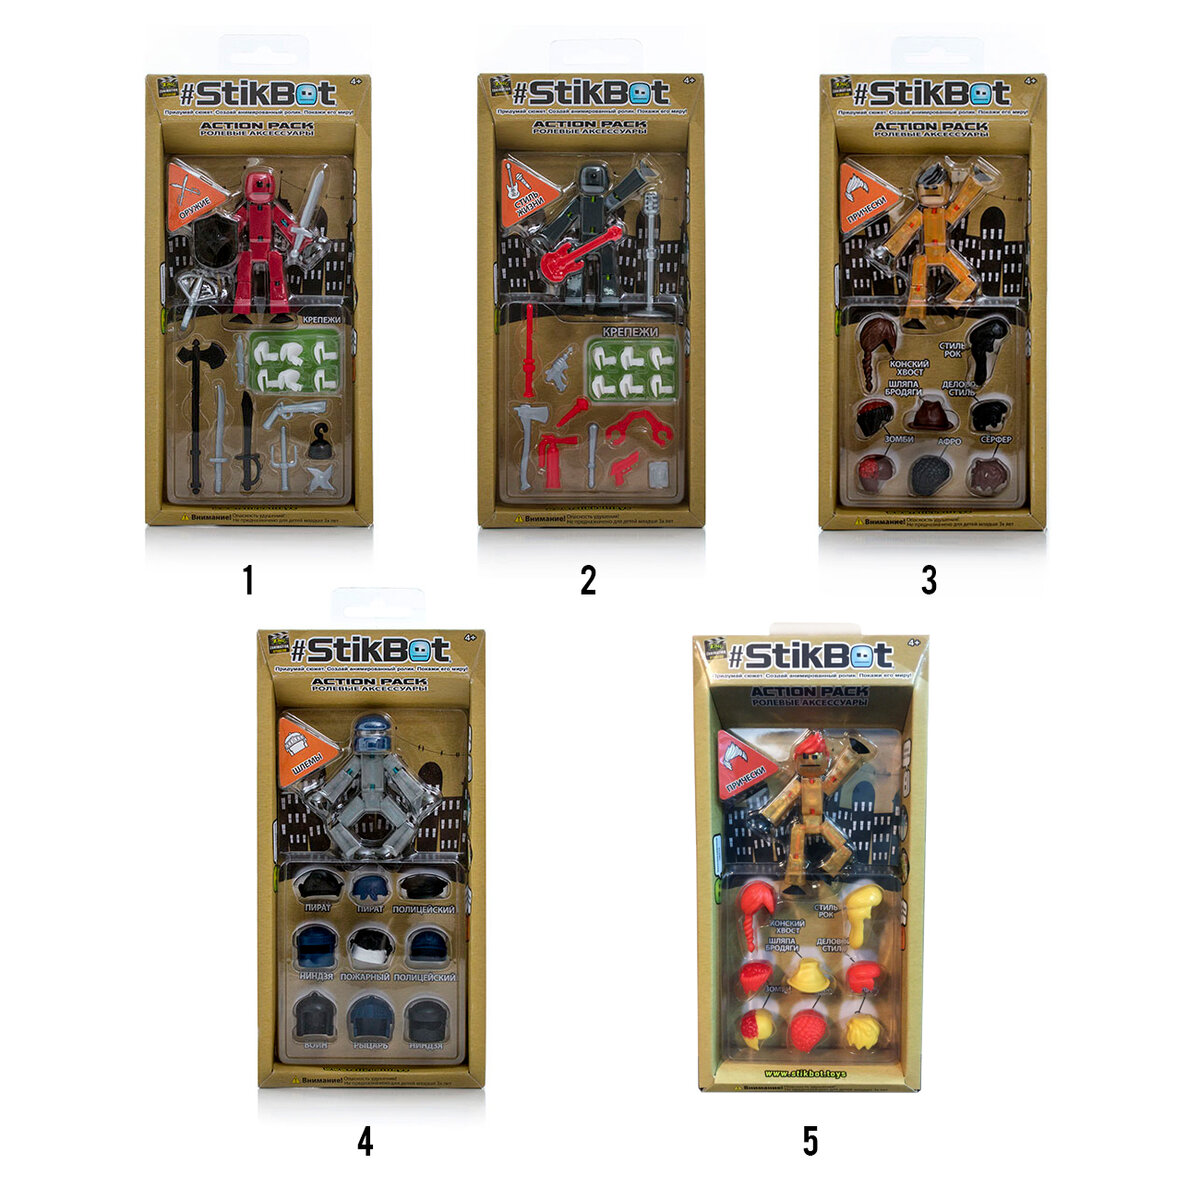 46e26e2c9dec Stik Bot набор для съемки мультфильмов с аксессуарами. В Украине ...